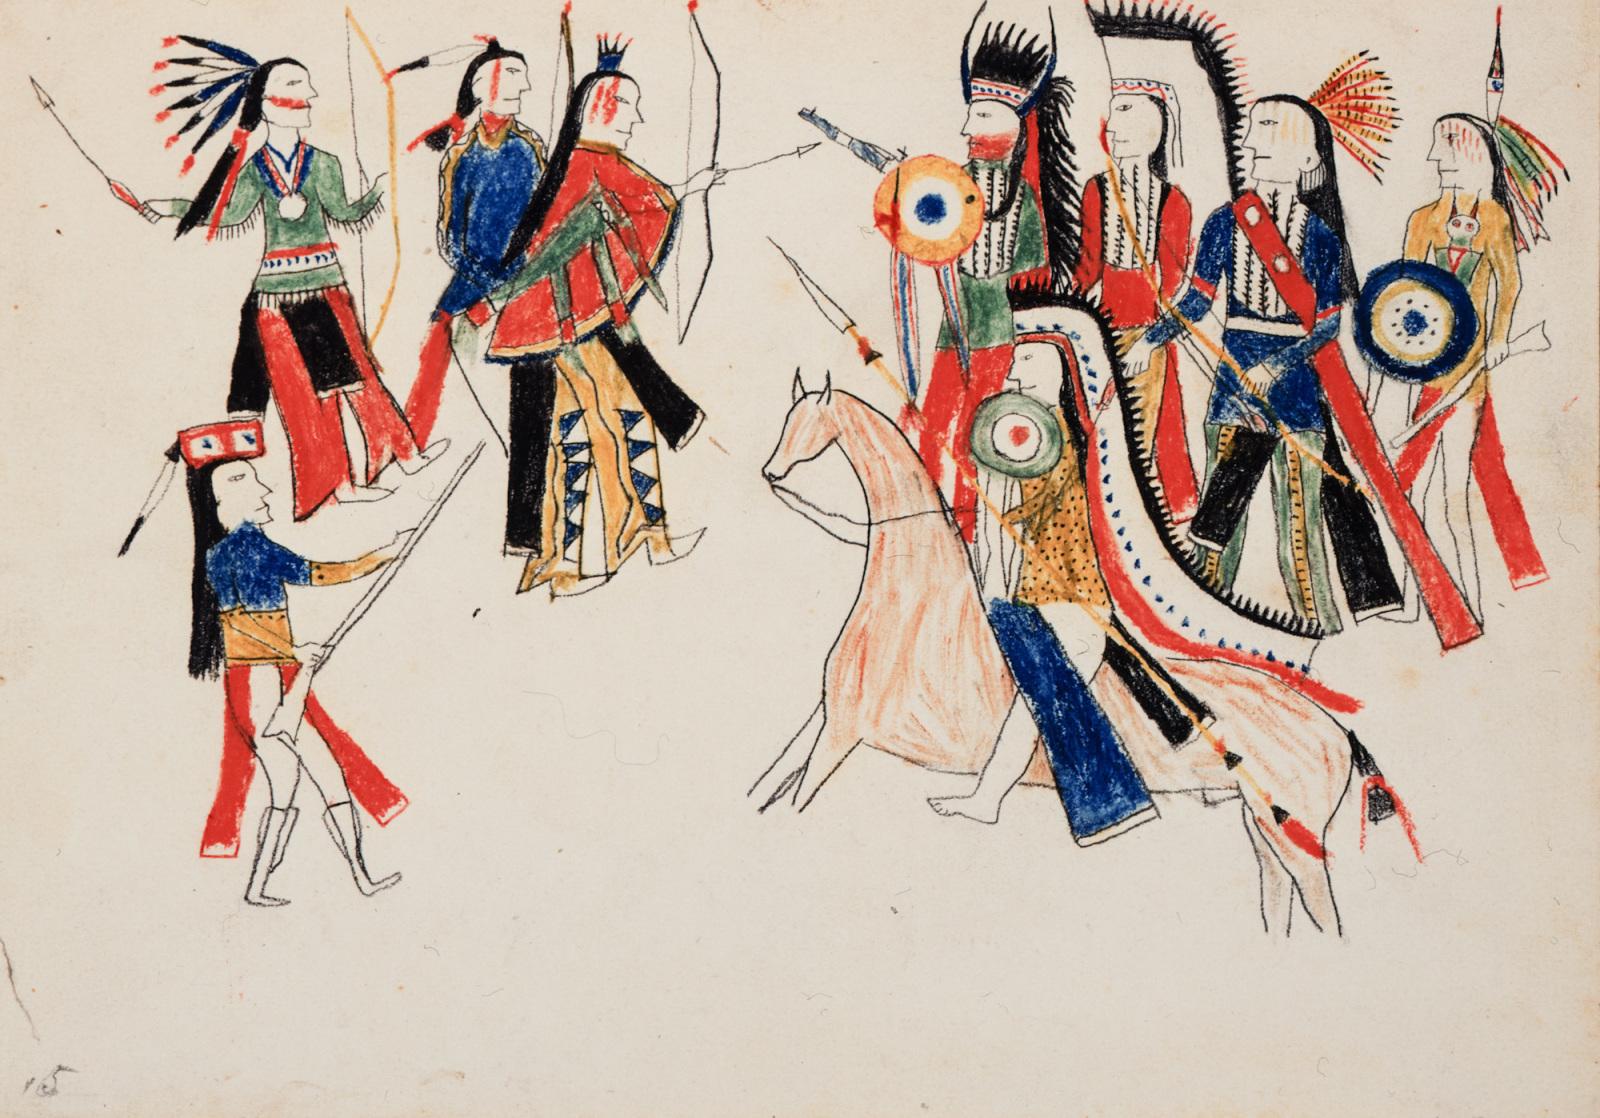 Kiowas and Navajos Preparing for a Fight